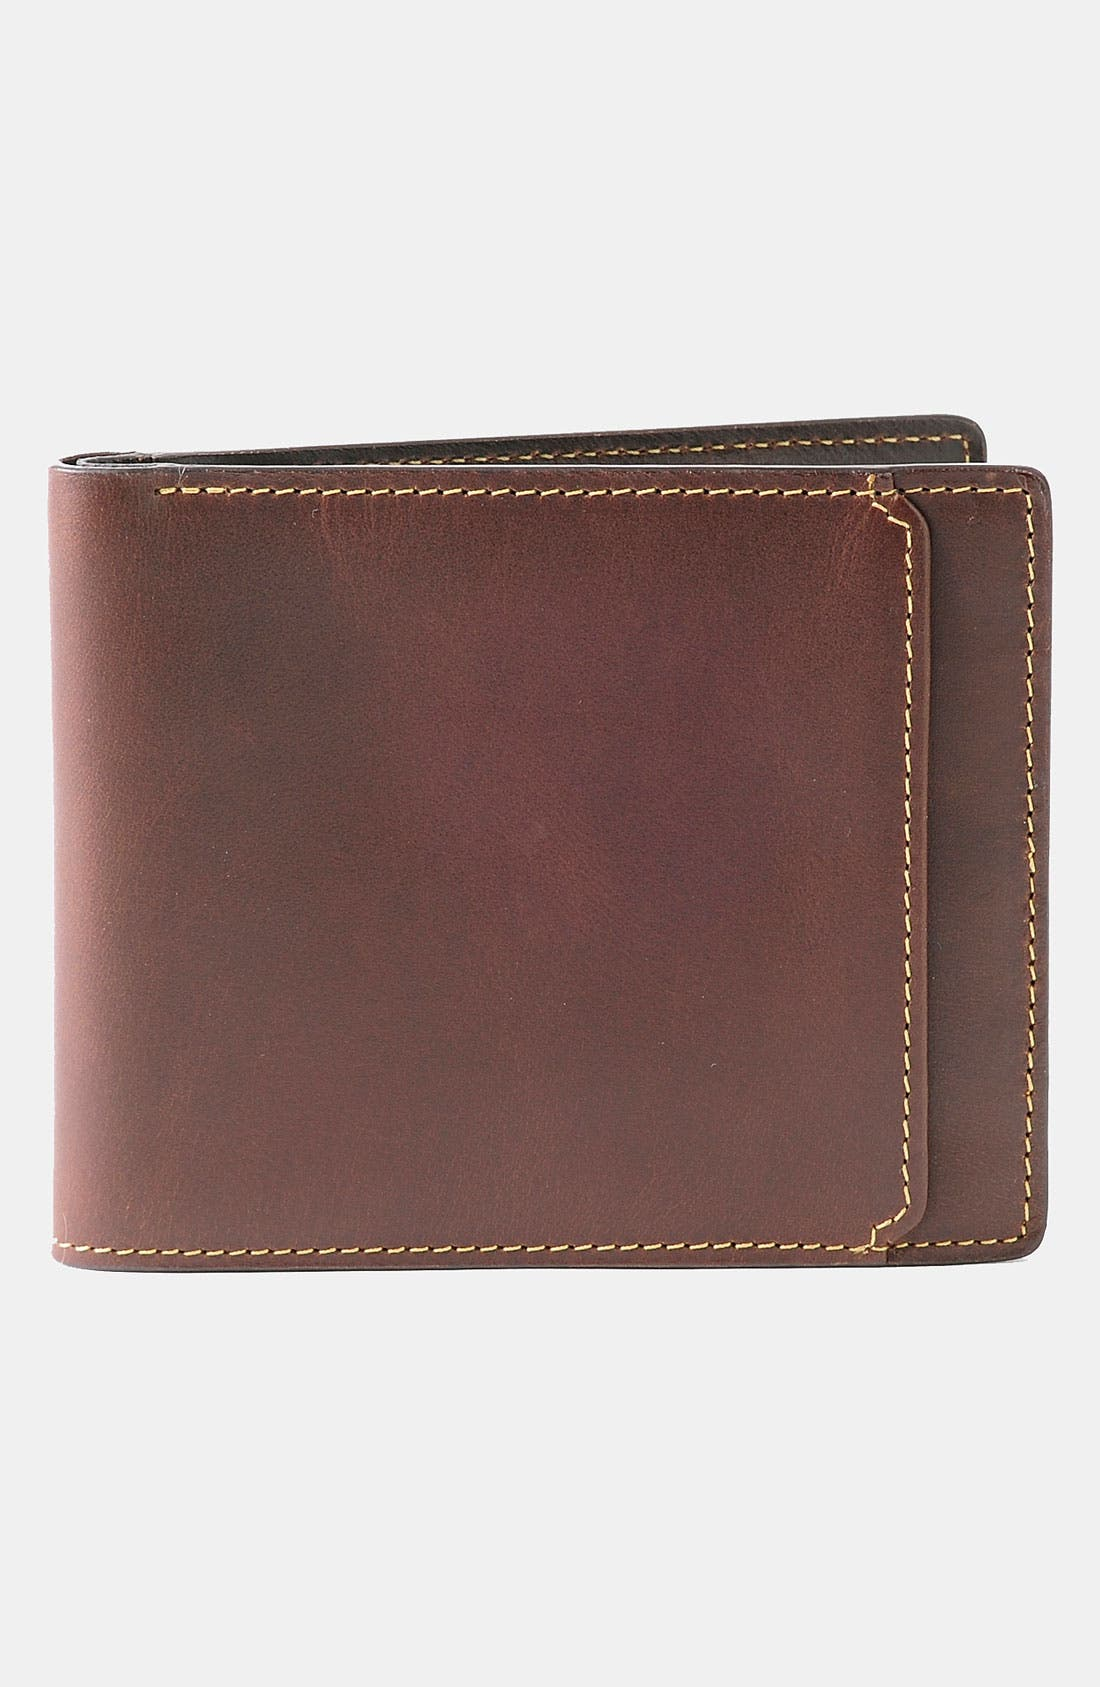 Boconi 'Bryant' RFID Blocker Slimfold Wallet